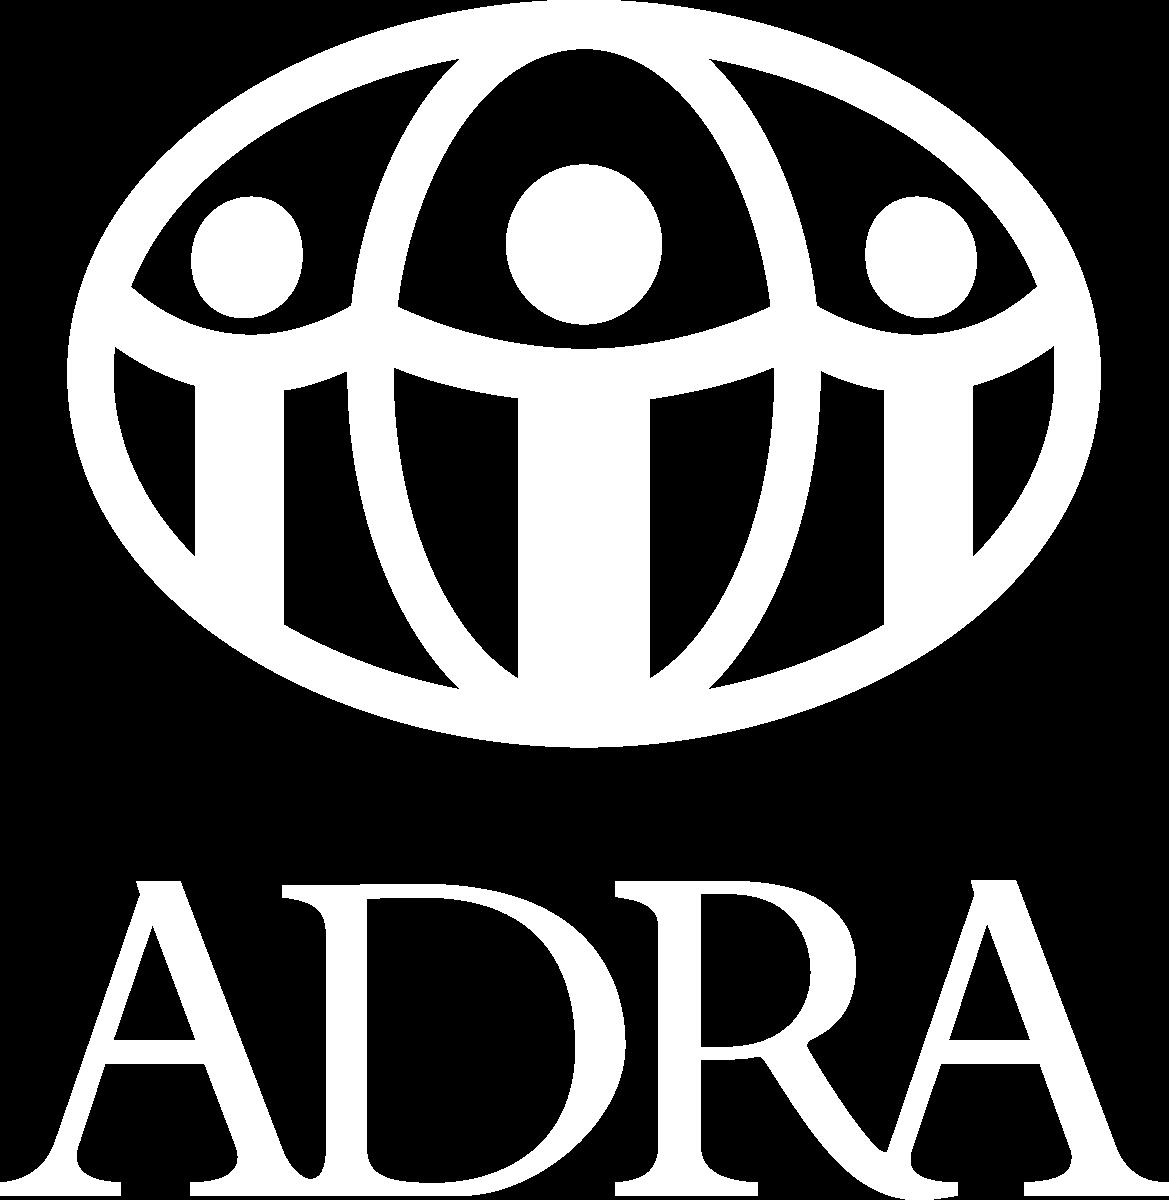 ADRA France